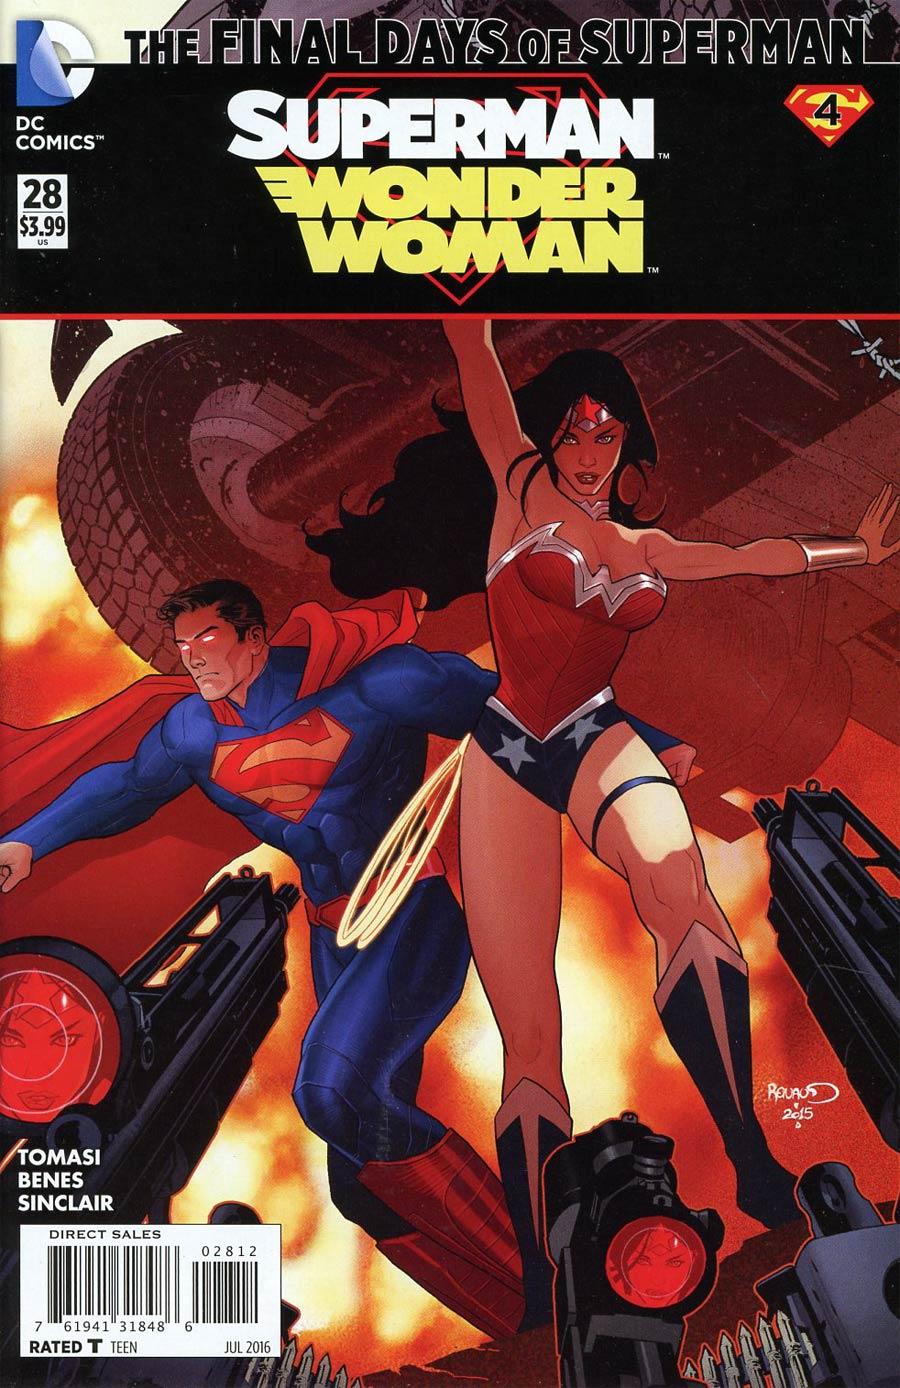 Superman Wonder Woman #28 Cover C 2nd Ptg Paul Renaud Variant Cover (Super League Part 4)